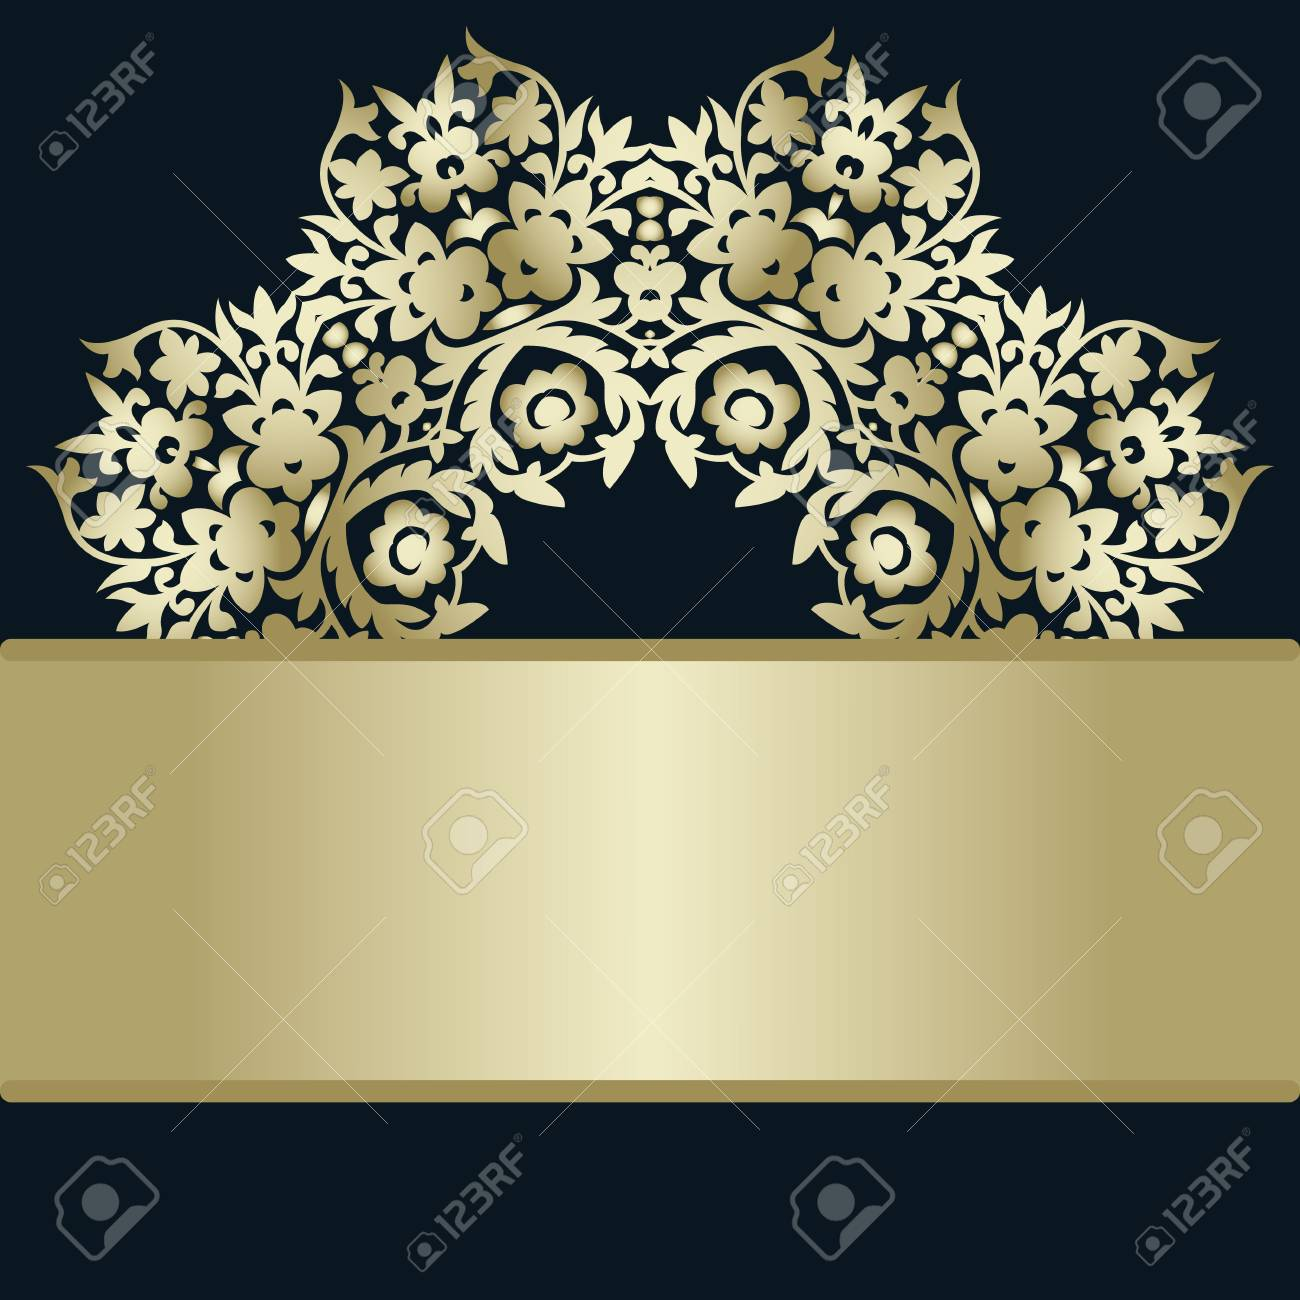 Blank Horizontal Stripe Label Invitation Card For The Wedding